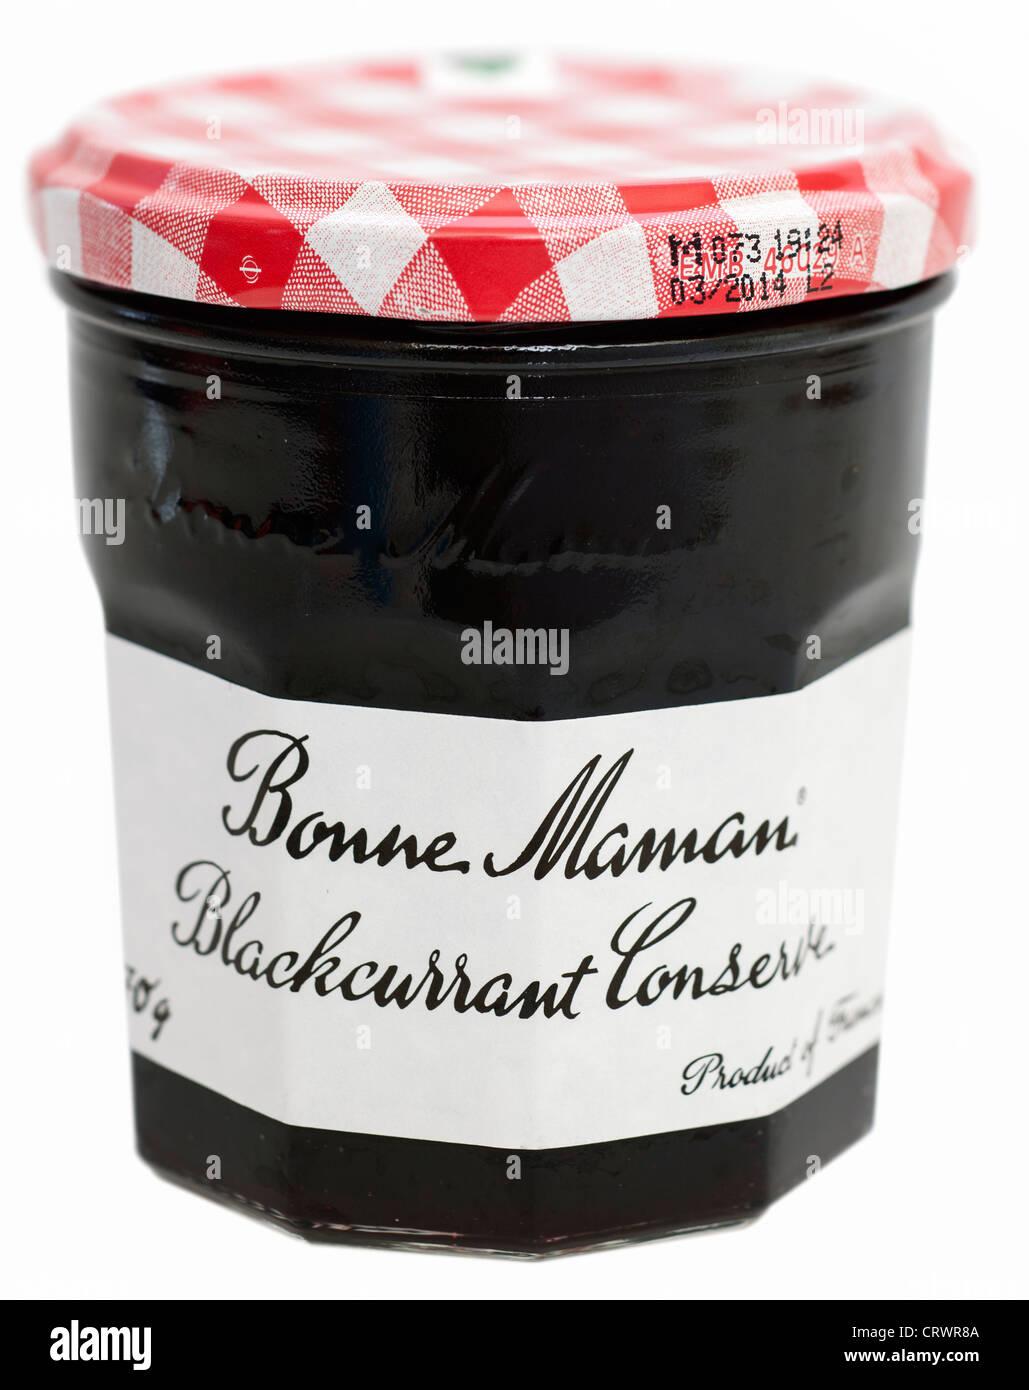 Jar of Bonne Maman blackcurrant conserve - Stock Image